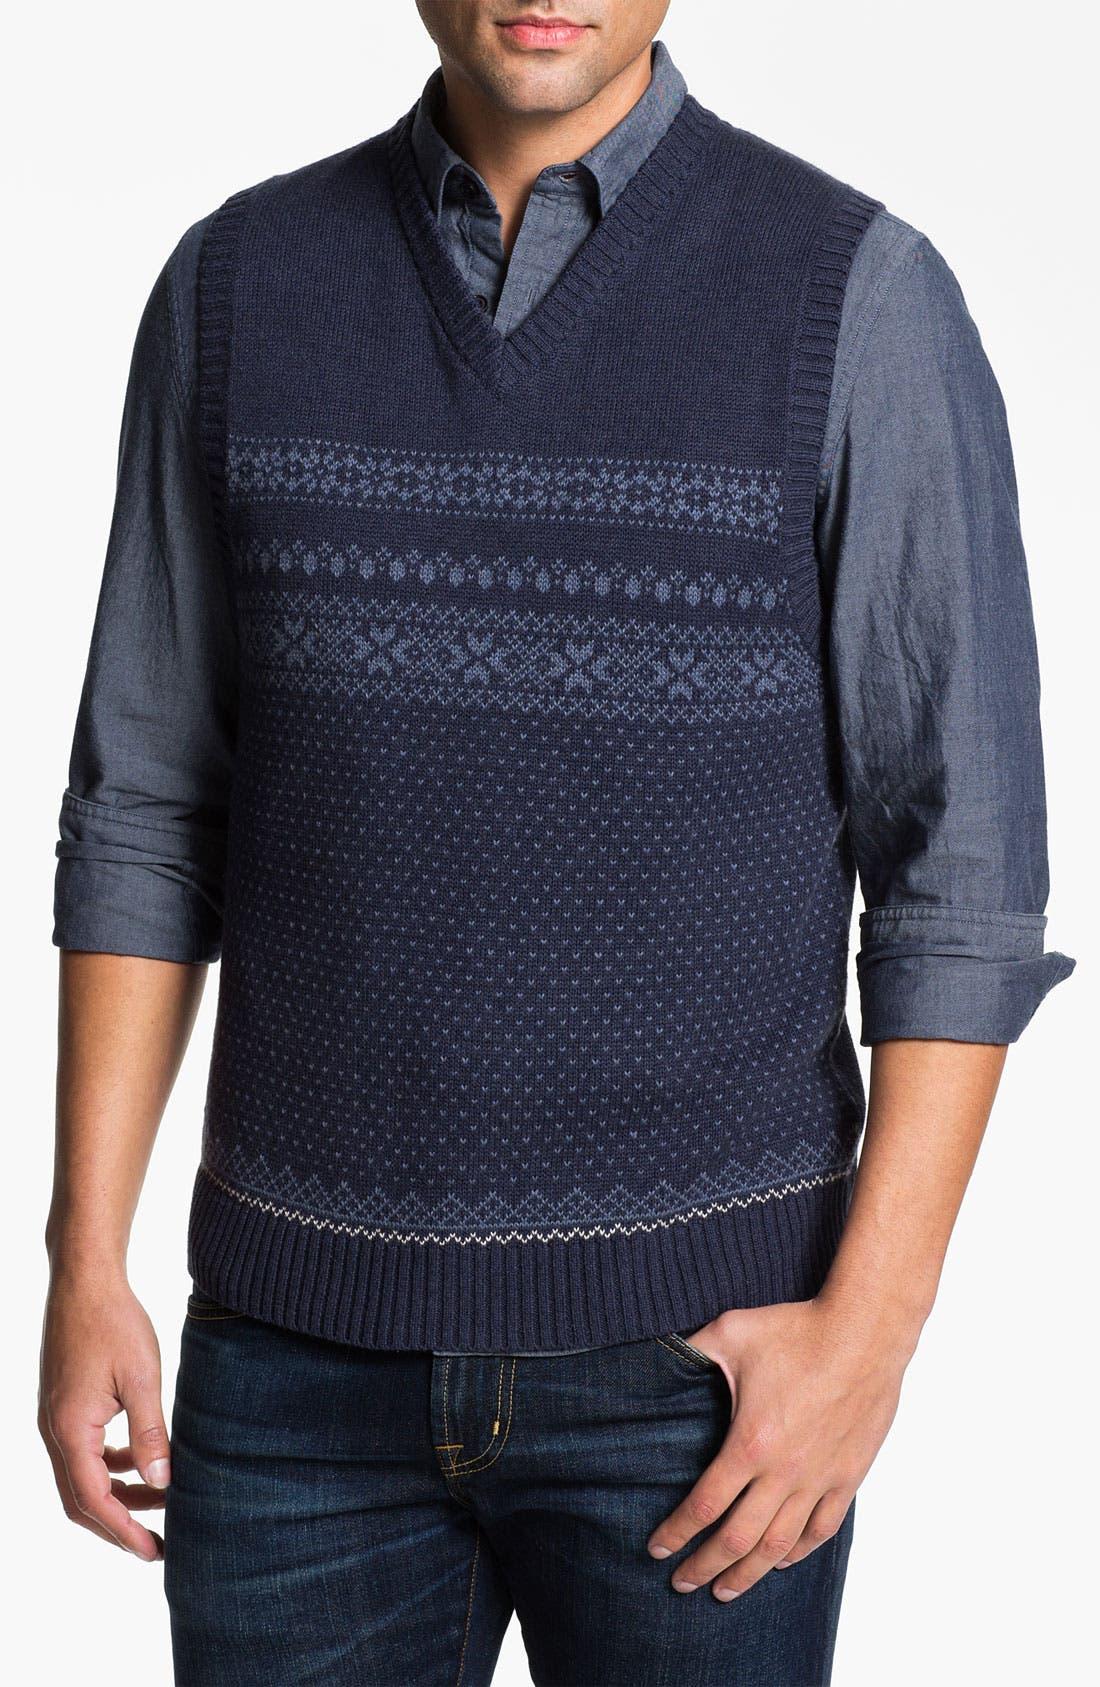 Alternate Image 1 Selected - Wallin & Bros. Fair Isle V-Neck Sweater Vest